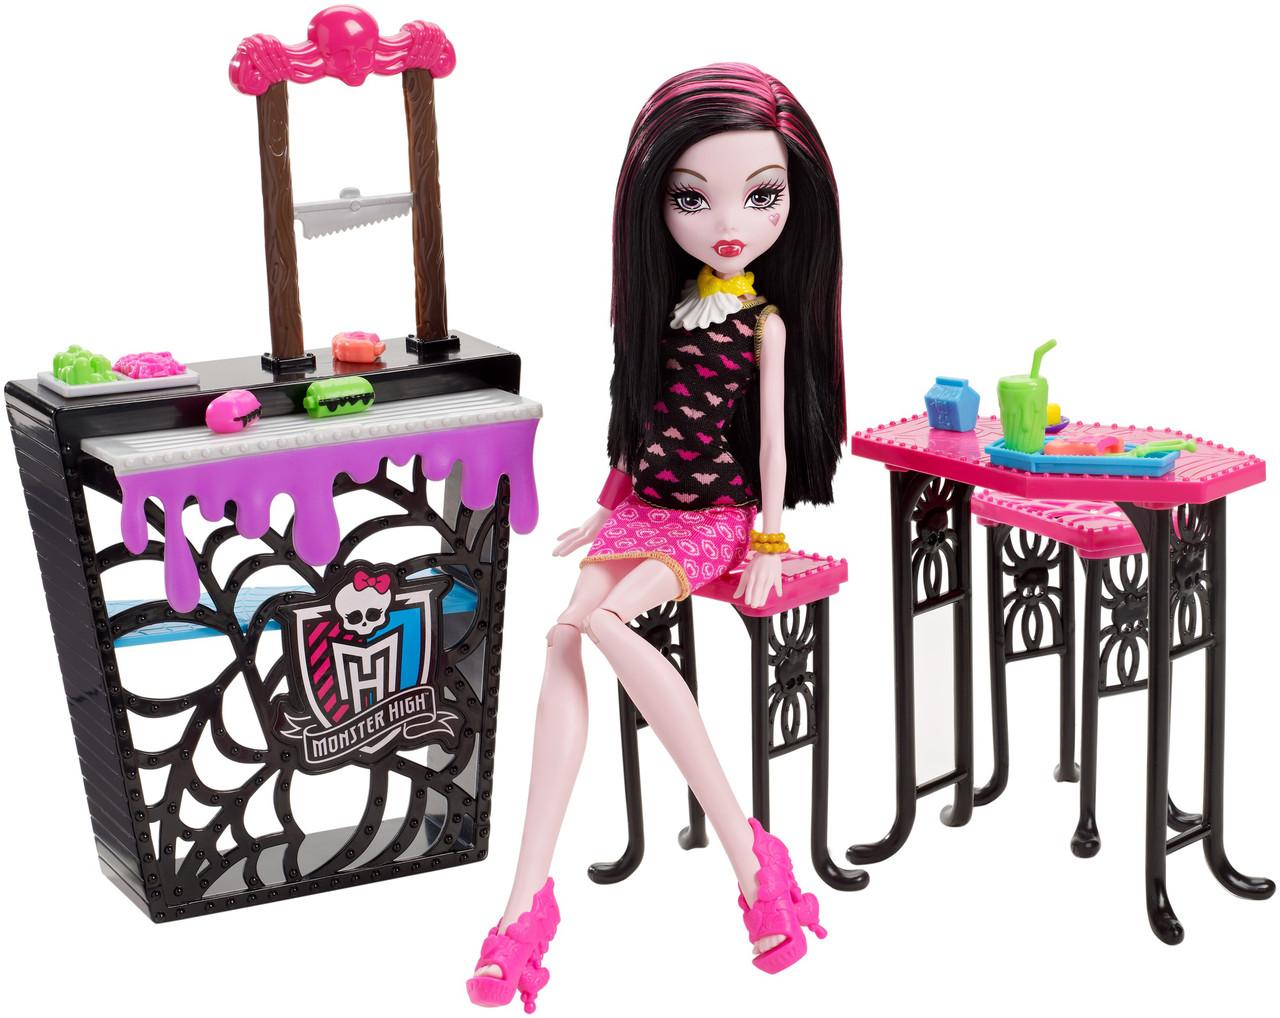 П, Monster High Beast Bites Cafe Draculaura Doll & Playset Игровой набор Дракулаура и Кафе Крипатерия